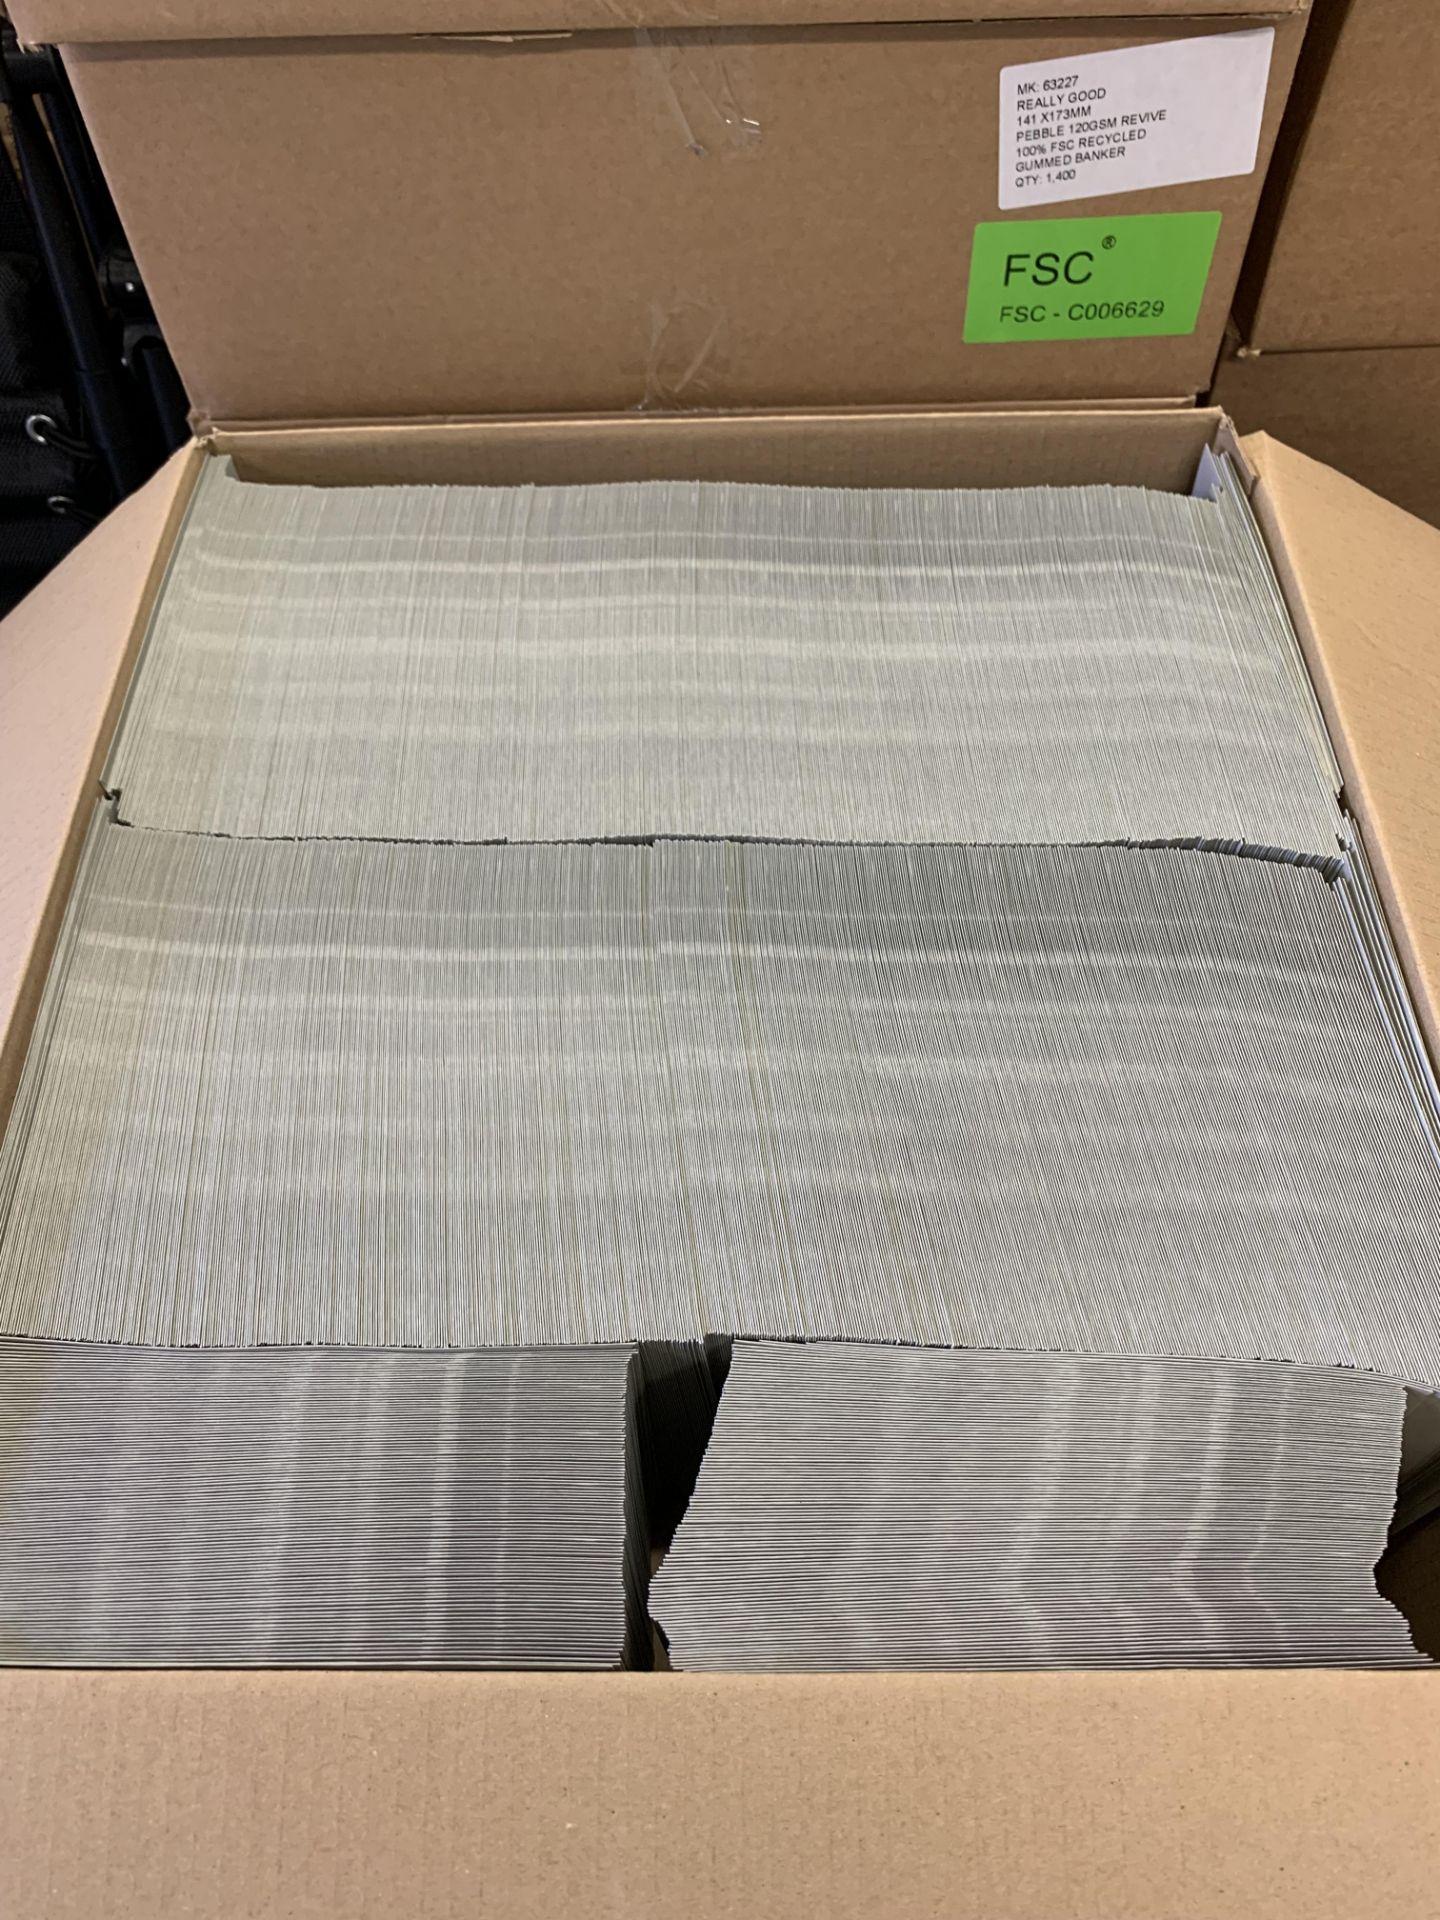 1400 Premium Pebble 120Sm Gu mmed Banker Envelopes 141 x 173 mm - Image 2 of 2